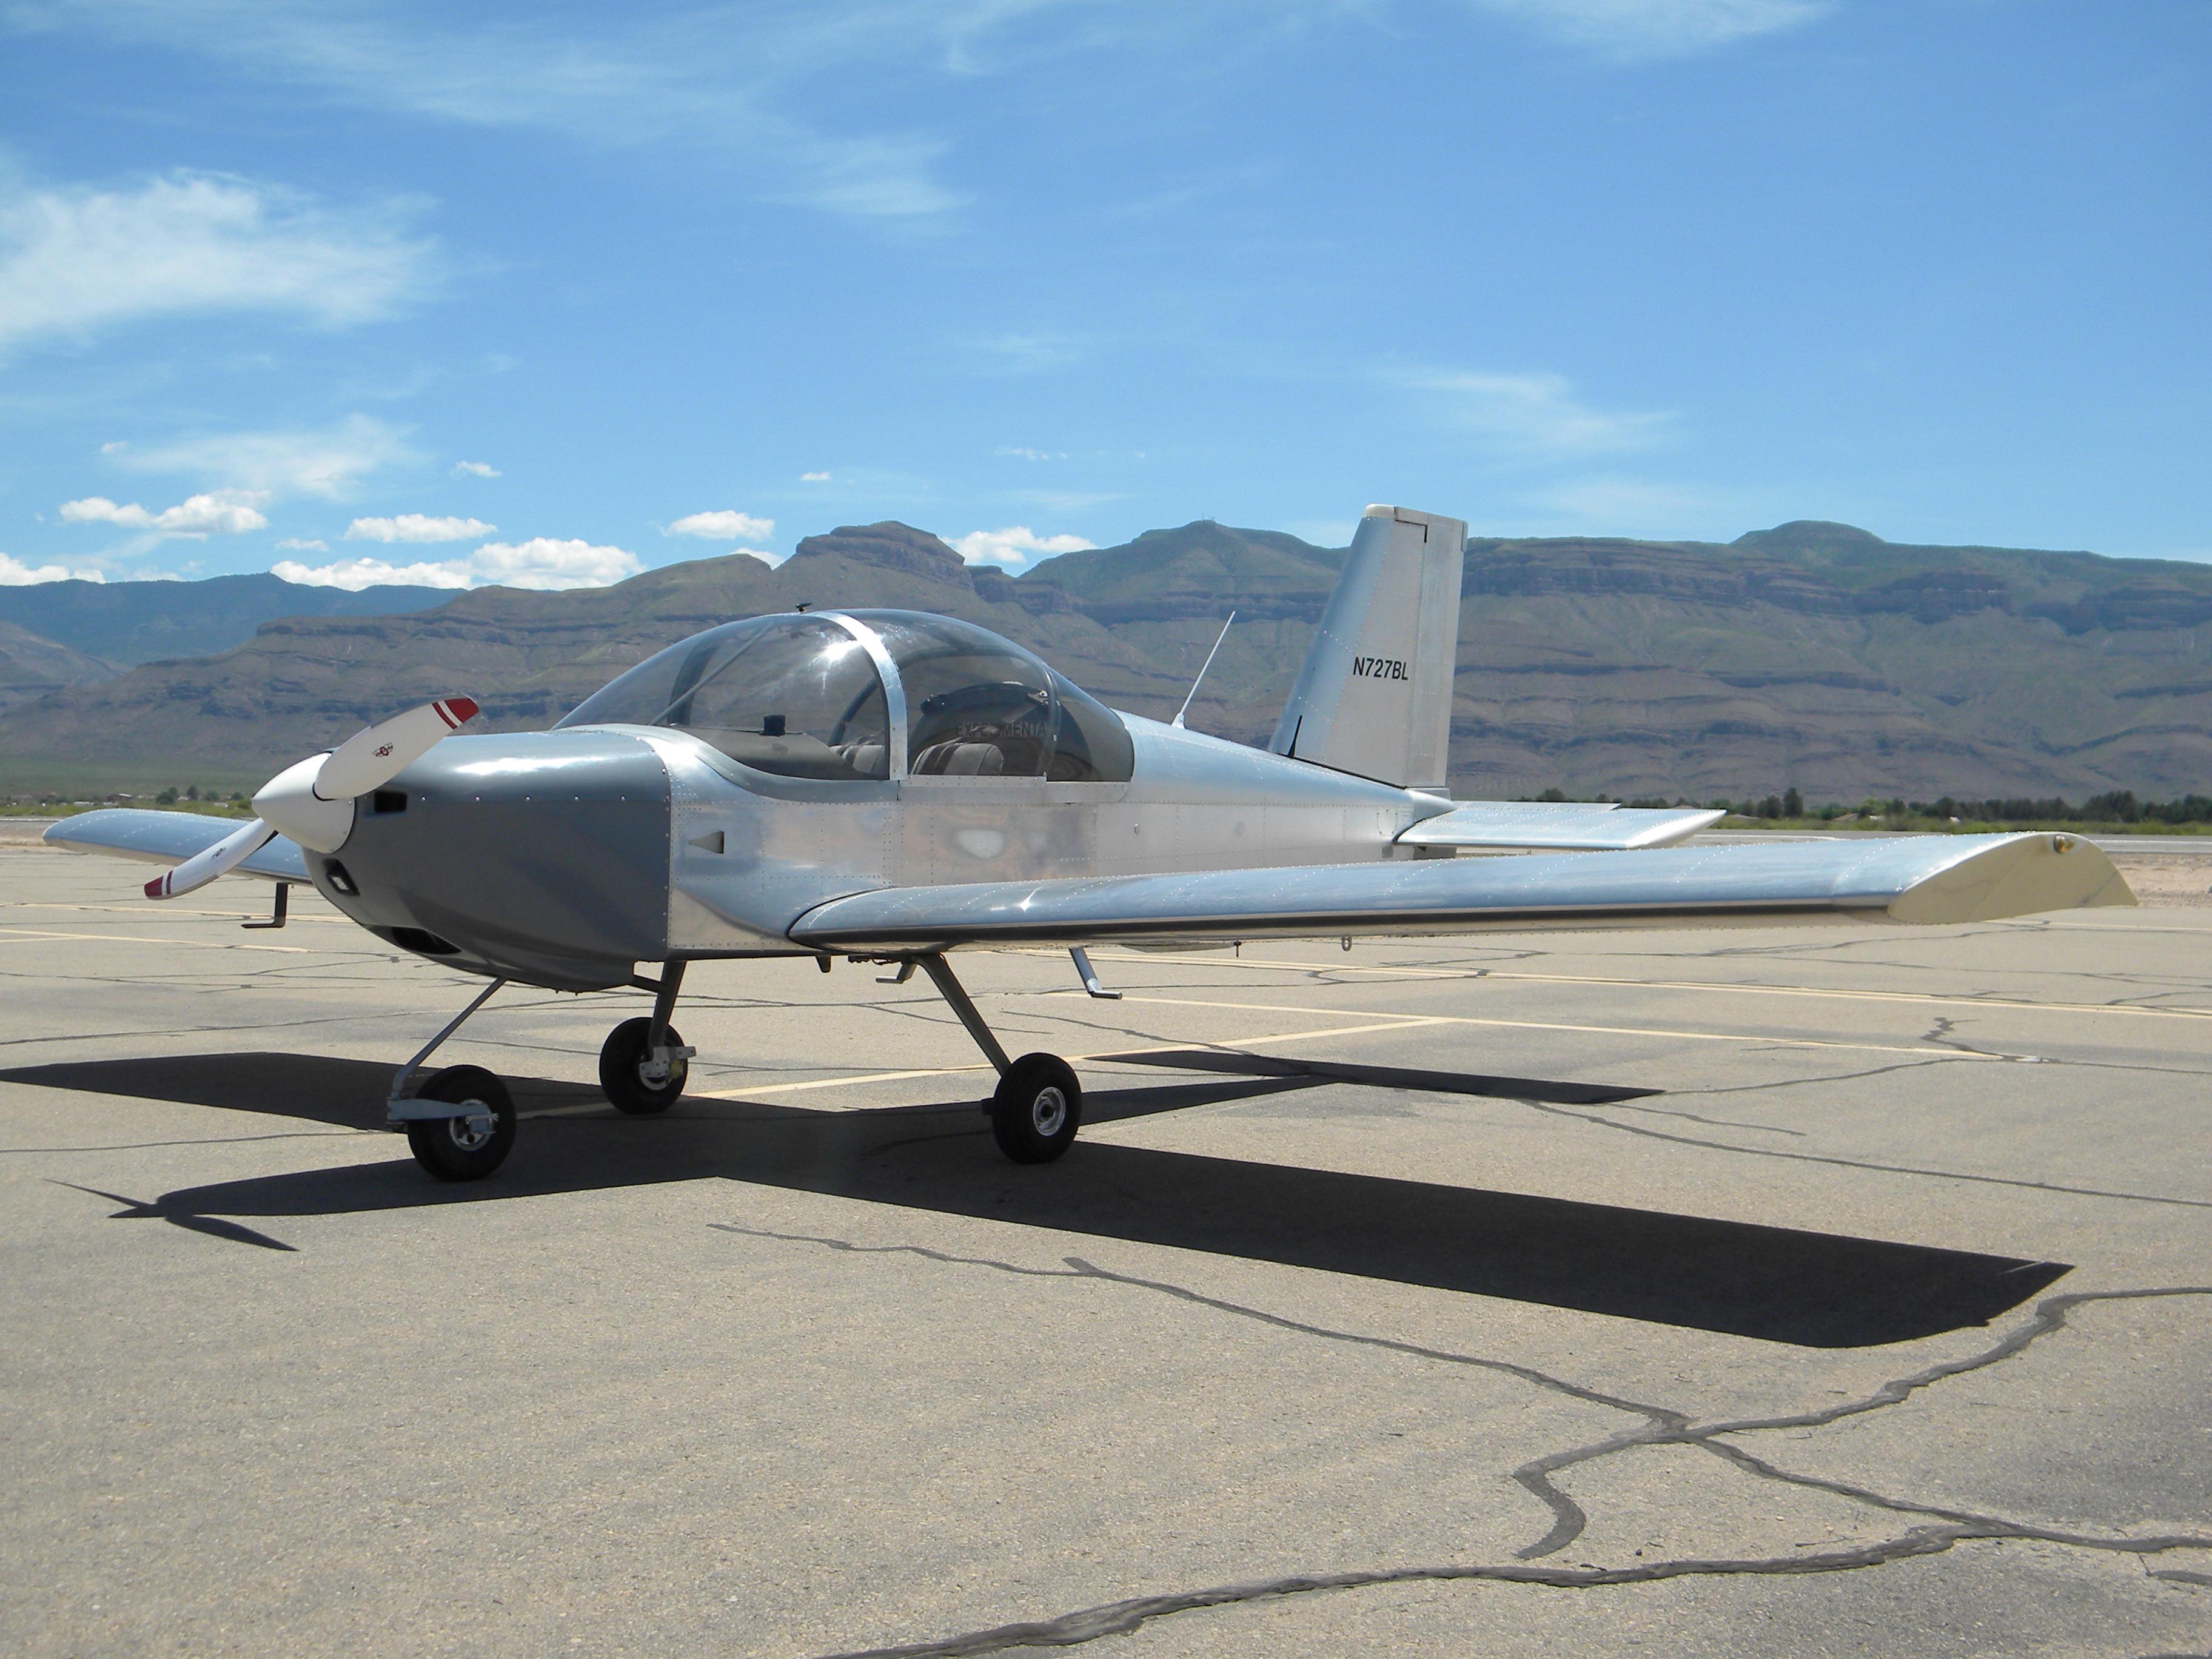 PRE-OWNED RANS | Sport Planes | Hays, KS | RANS Designs, Inc